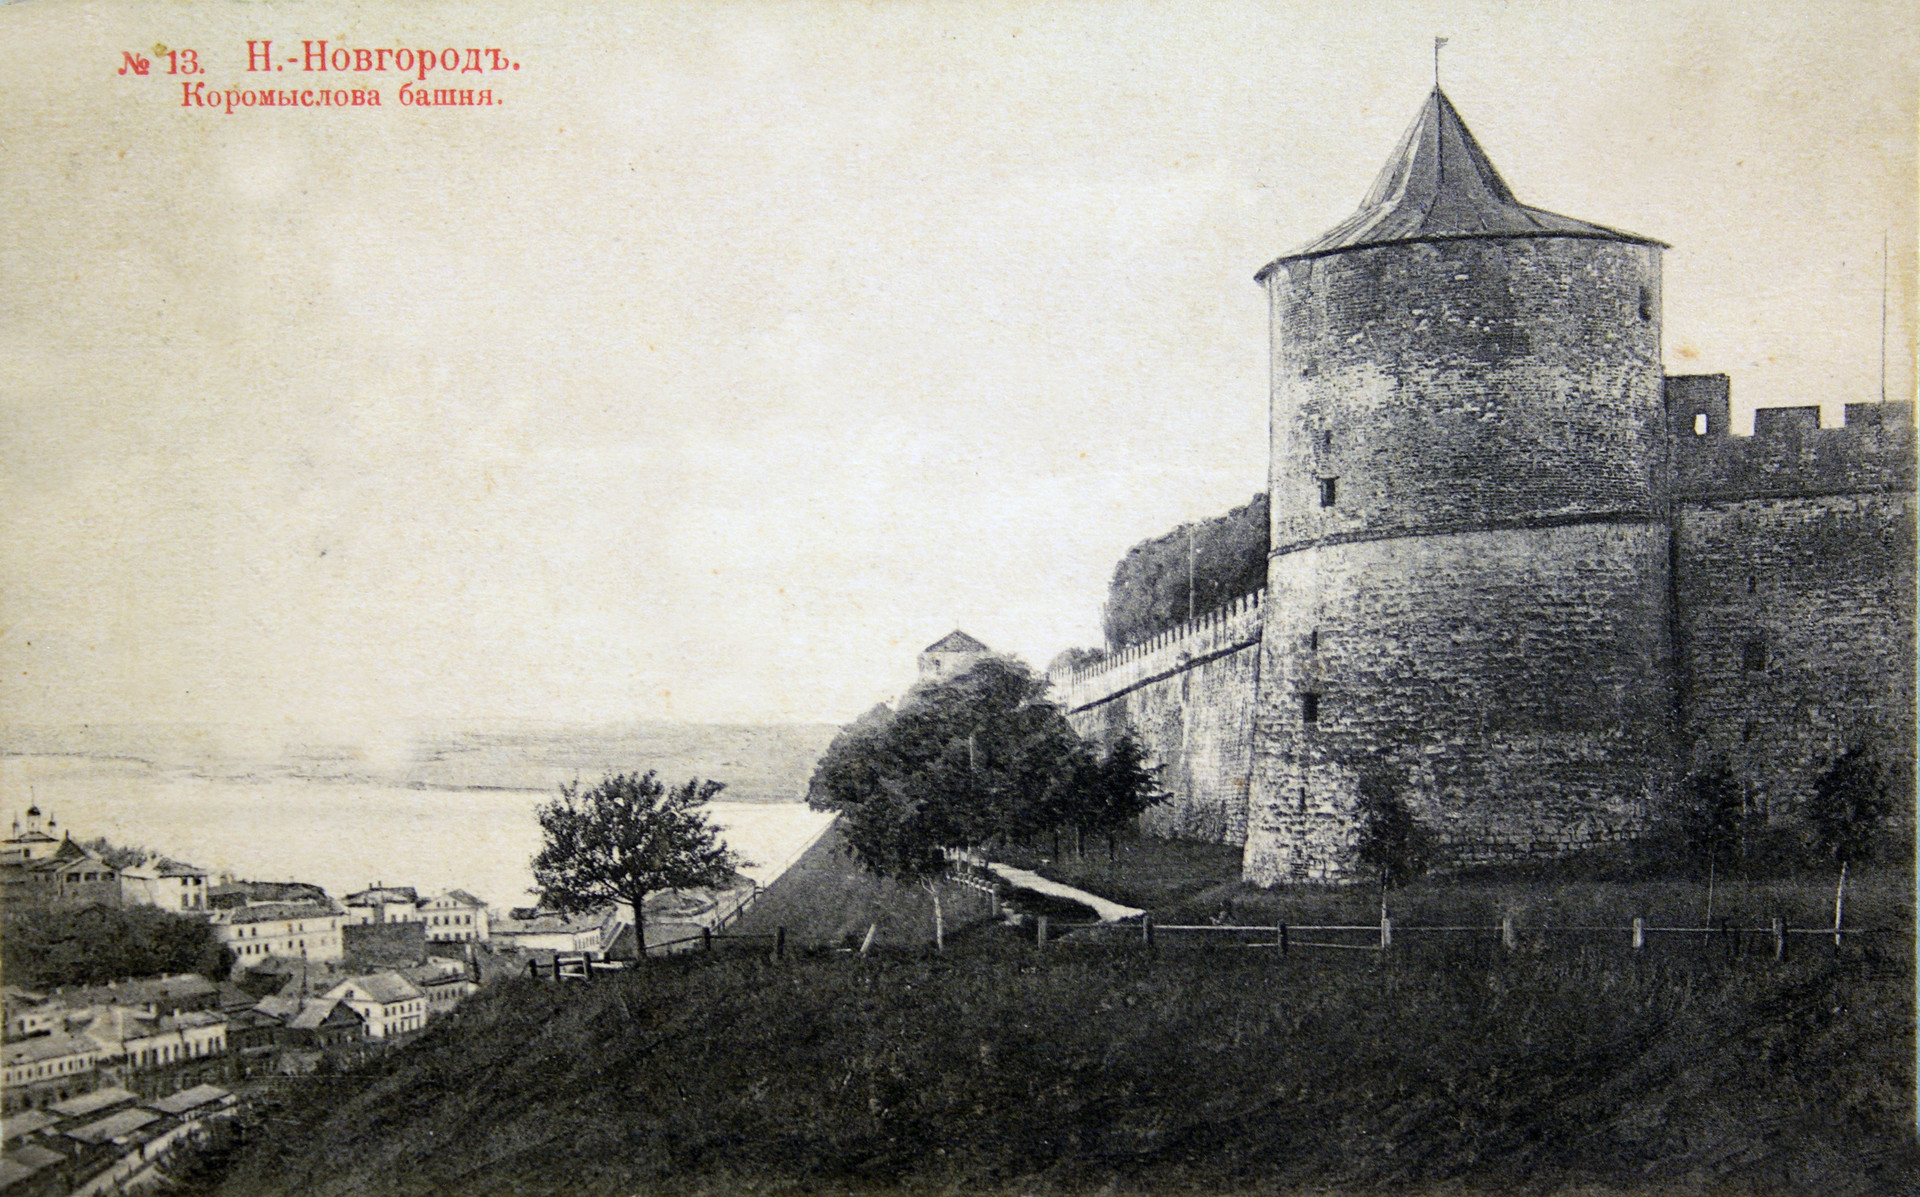 Koromislov stolp, Novgorod, 1900